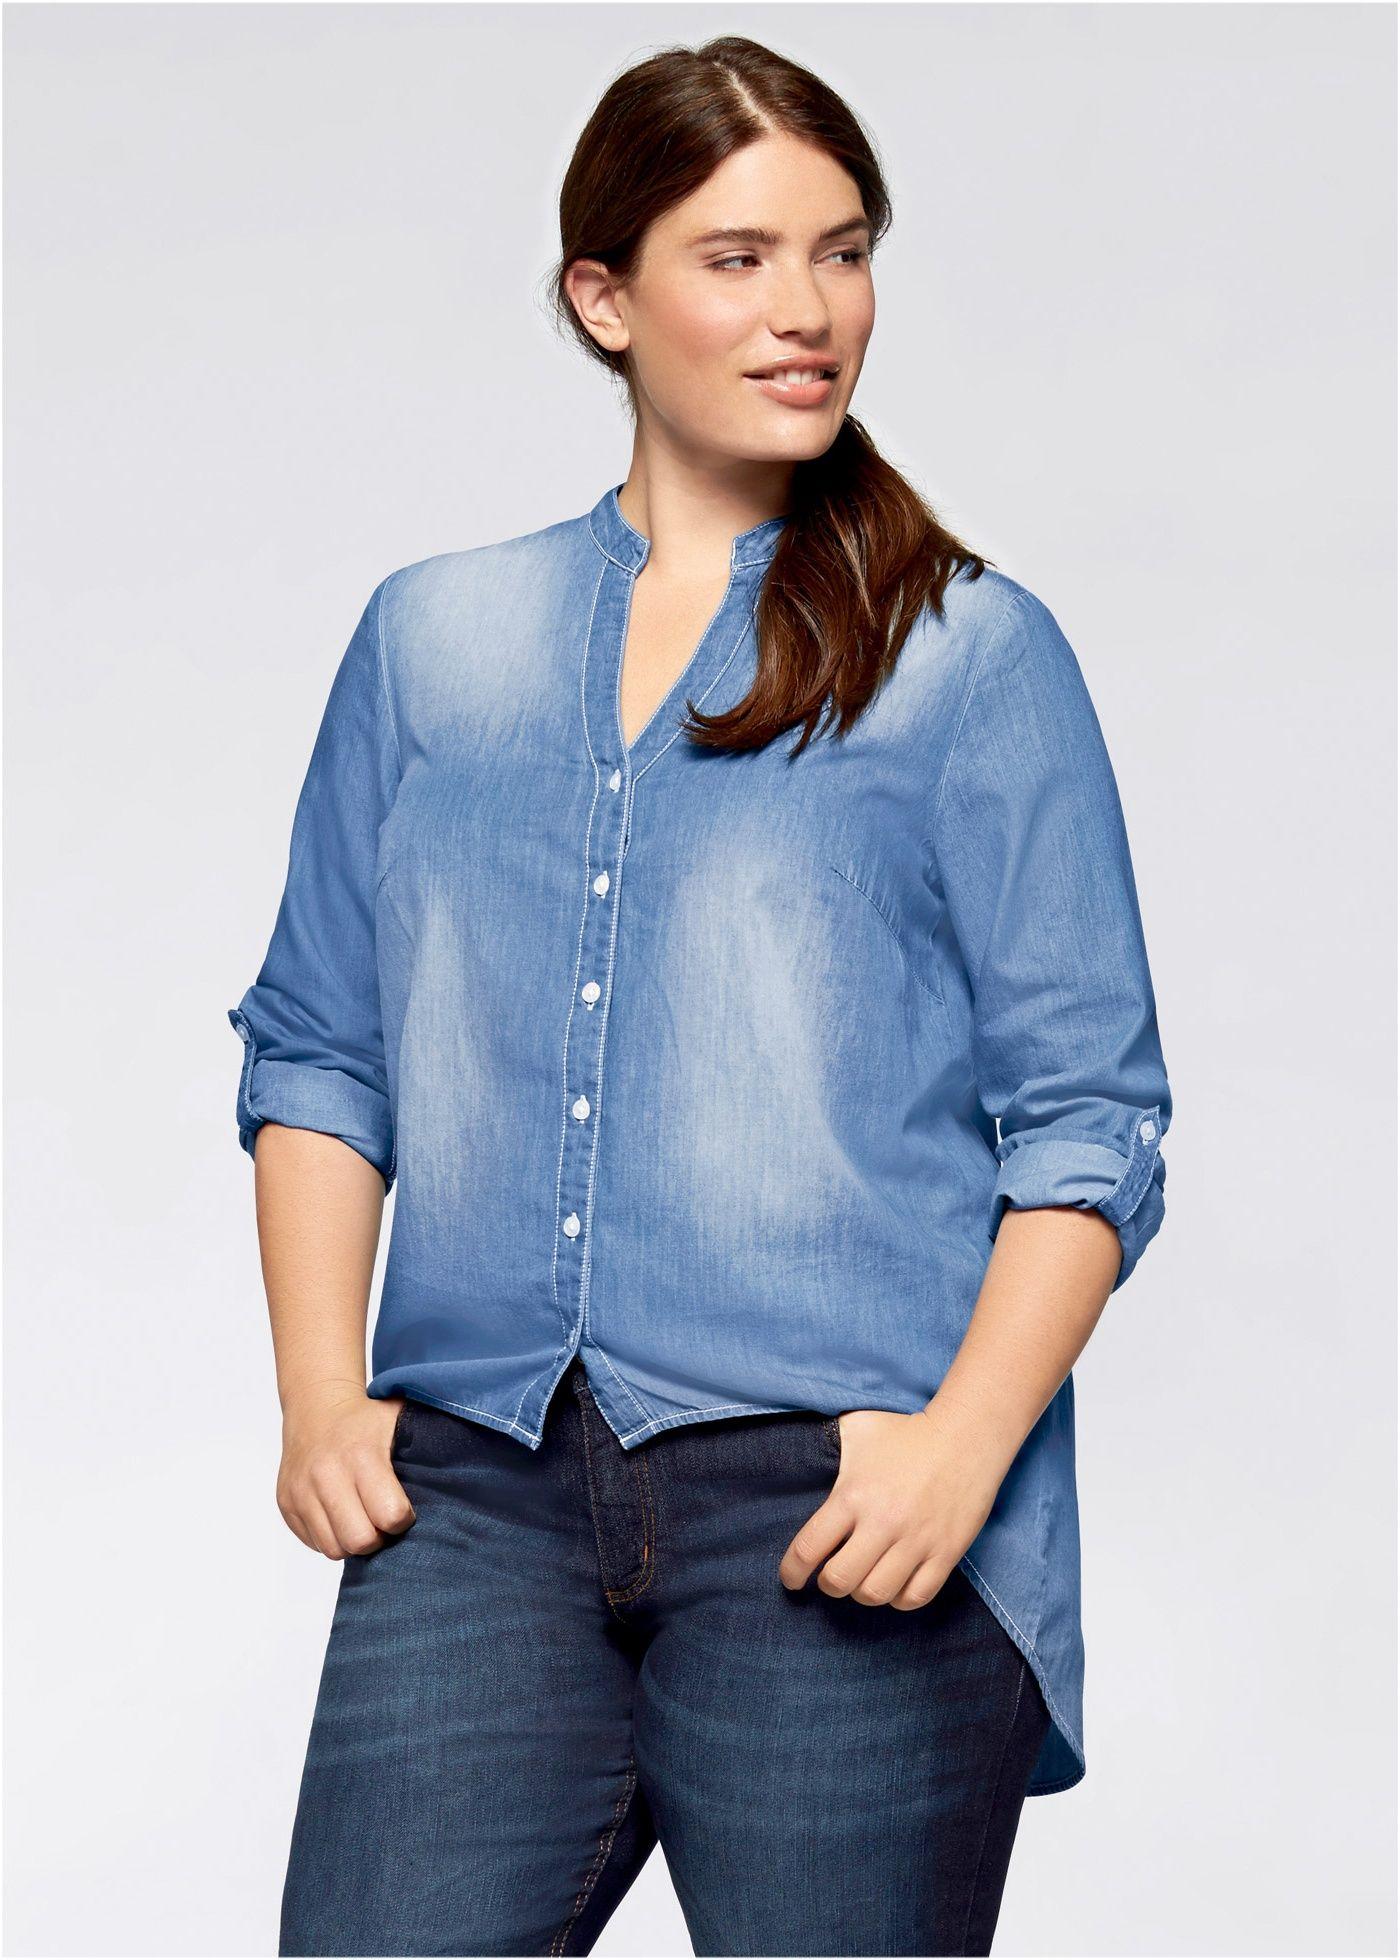 2181cd8359 Camisa jeans gola de padre Azul delavé usado - Plus Size - bonprix.com.